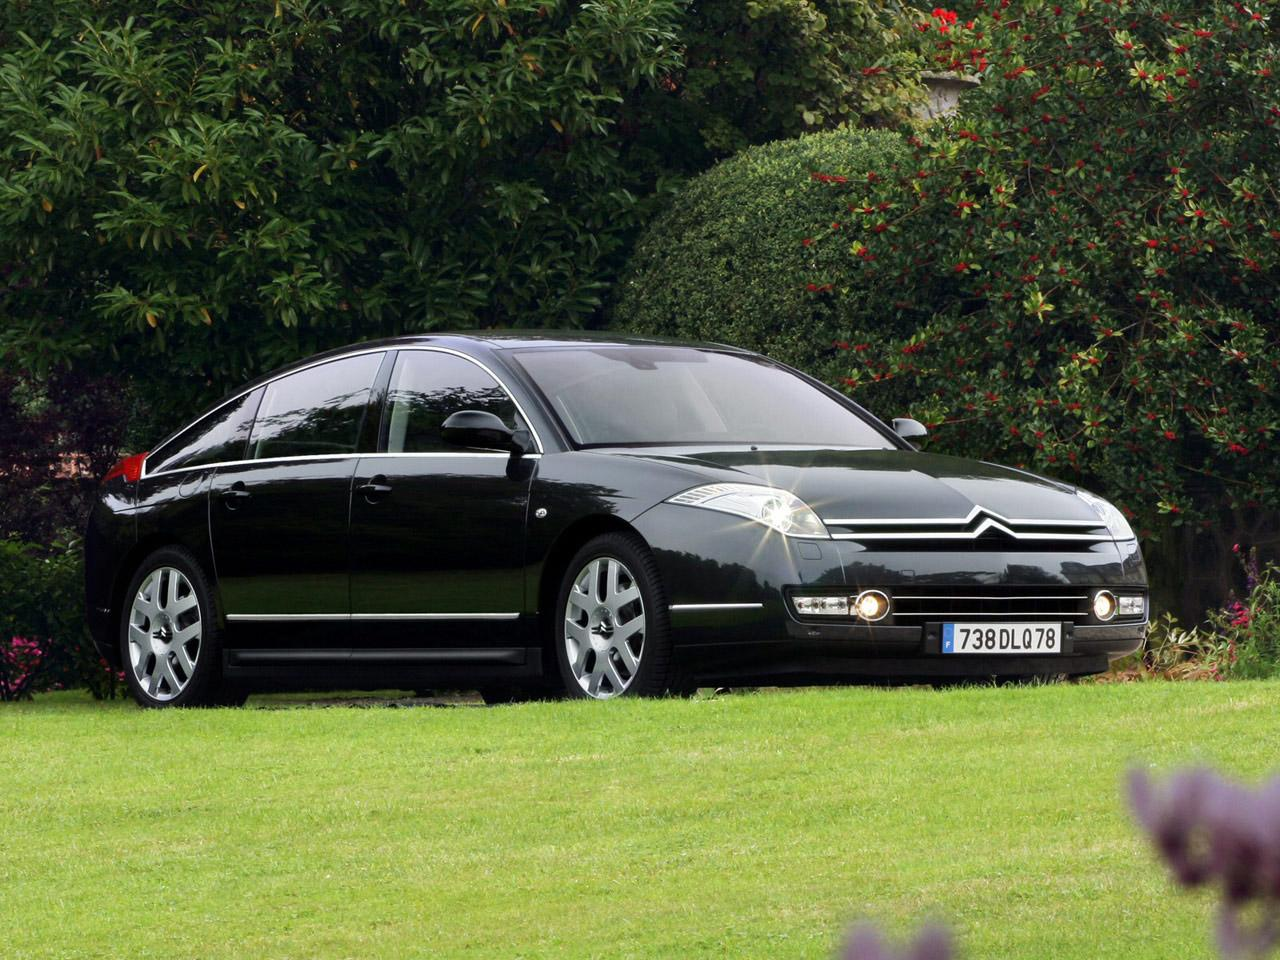 C6 V6 HDI exclusive του 2005, μπροστά ¾